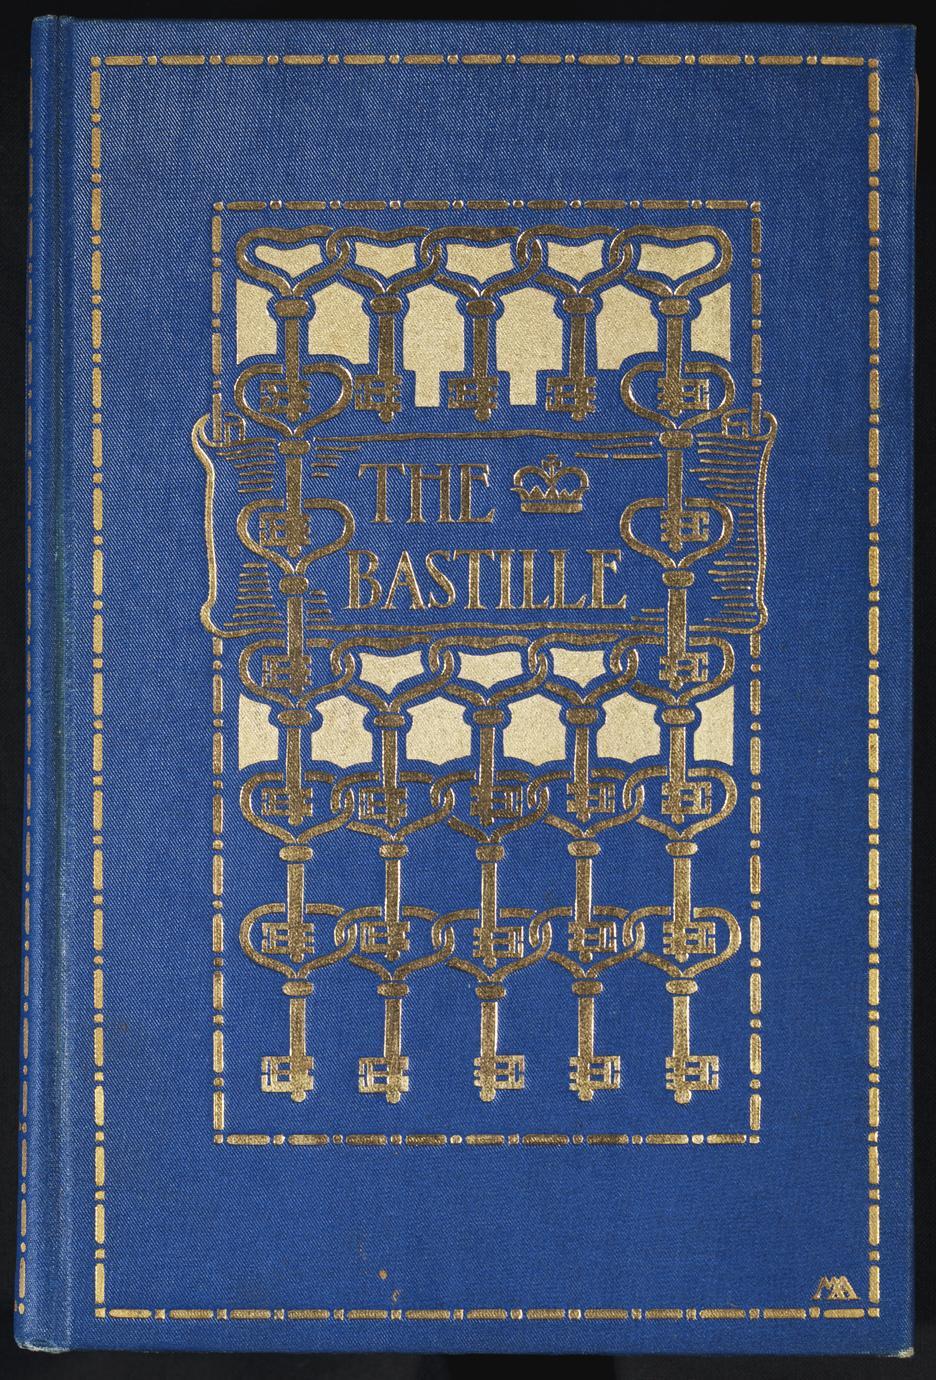 The Bastille (1 of 4)